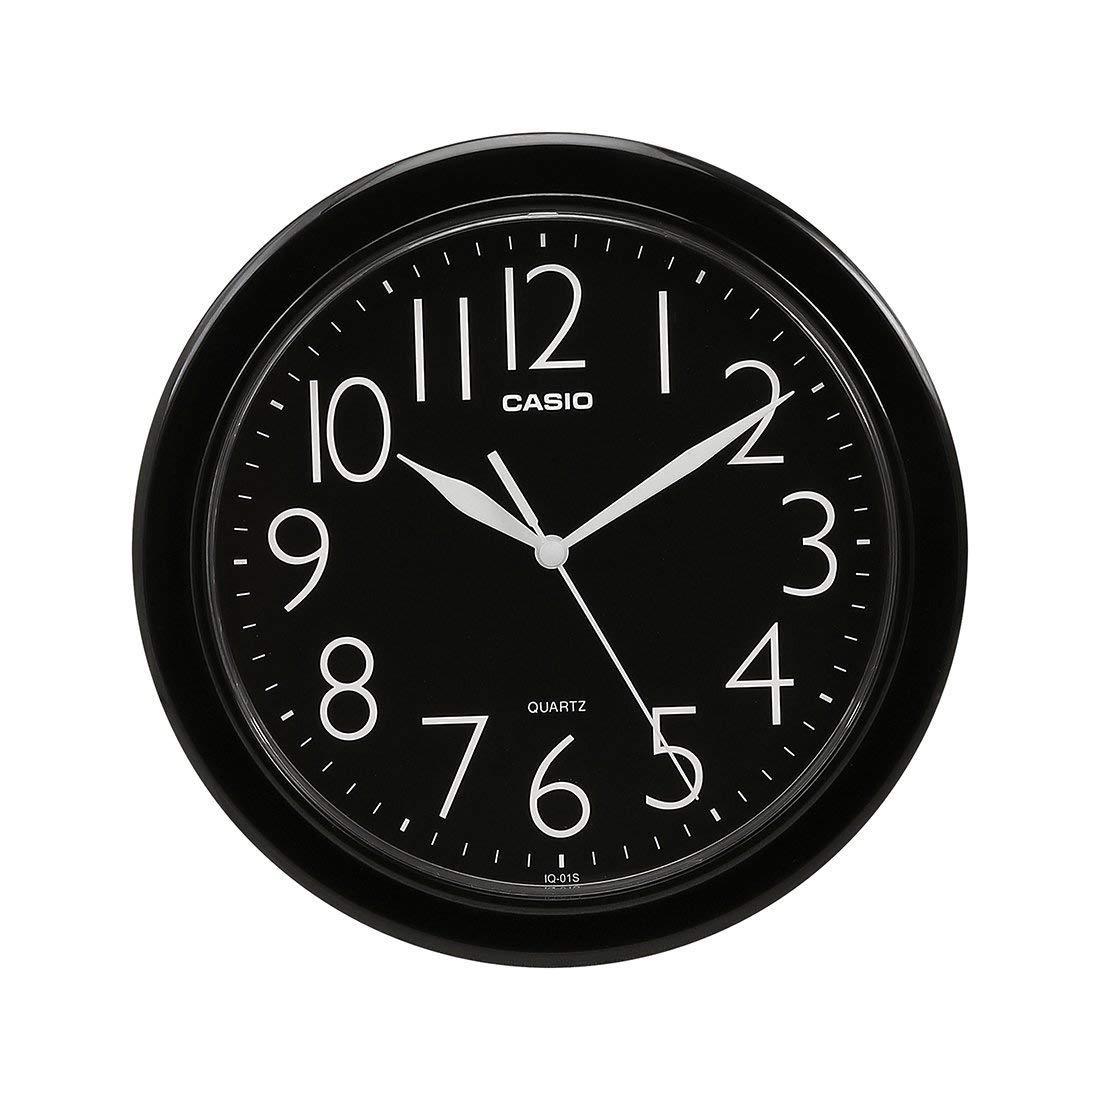 Casio 10 INCHES Analog Wall Clock IQ-01S